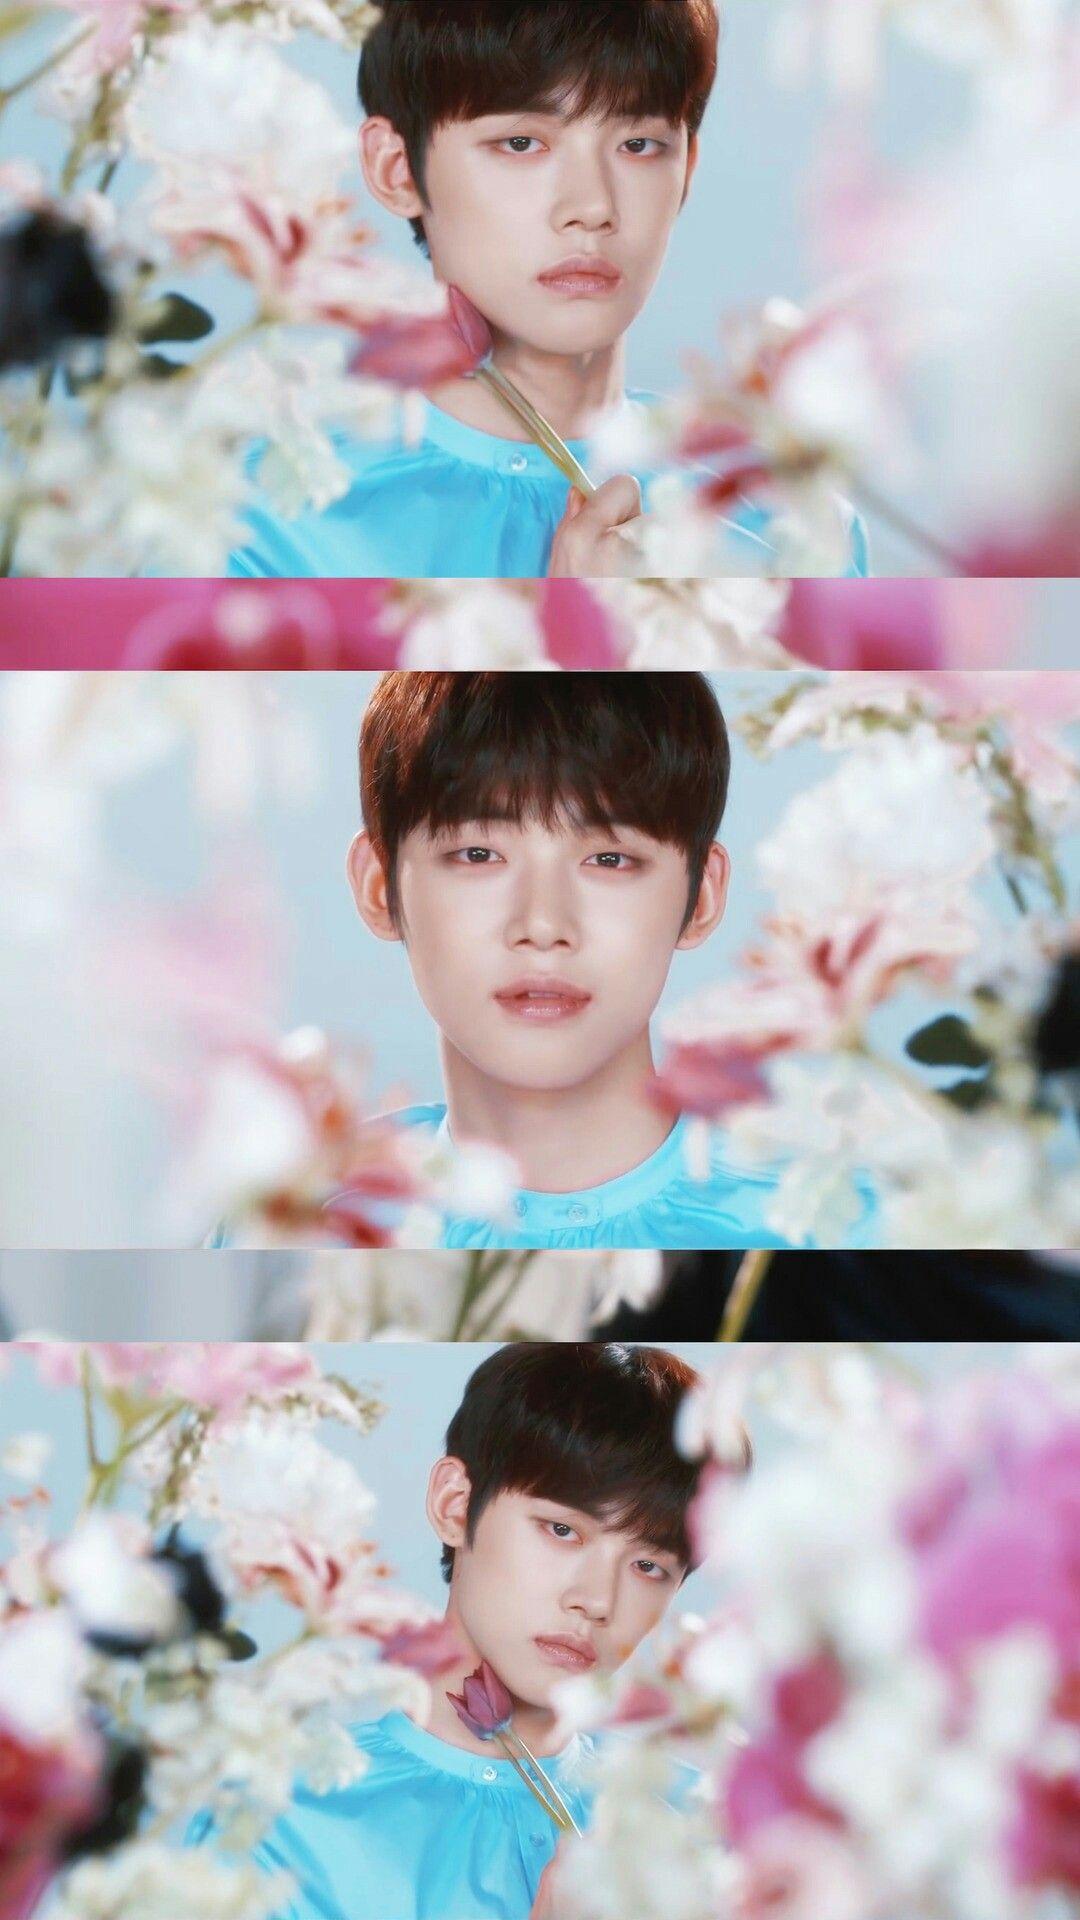 TXTYeonjun in 2019 Wallpaper, Aesthetic wallpapers, What